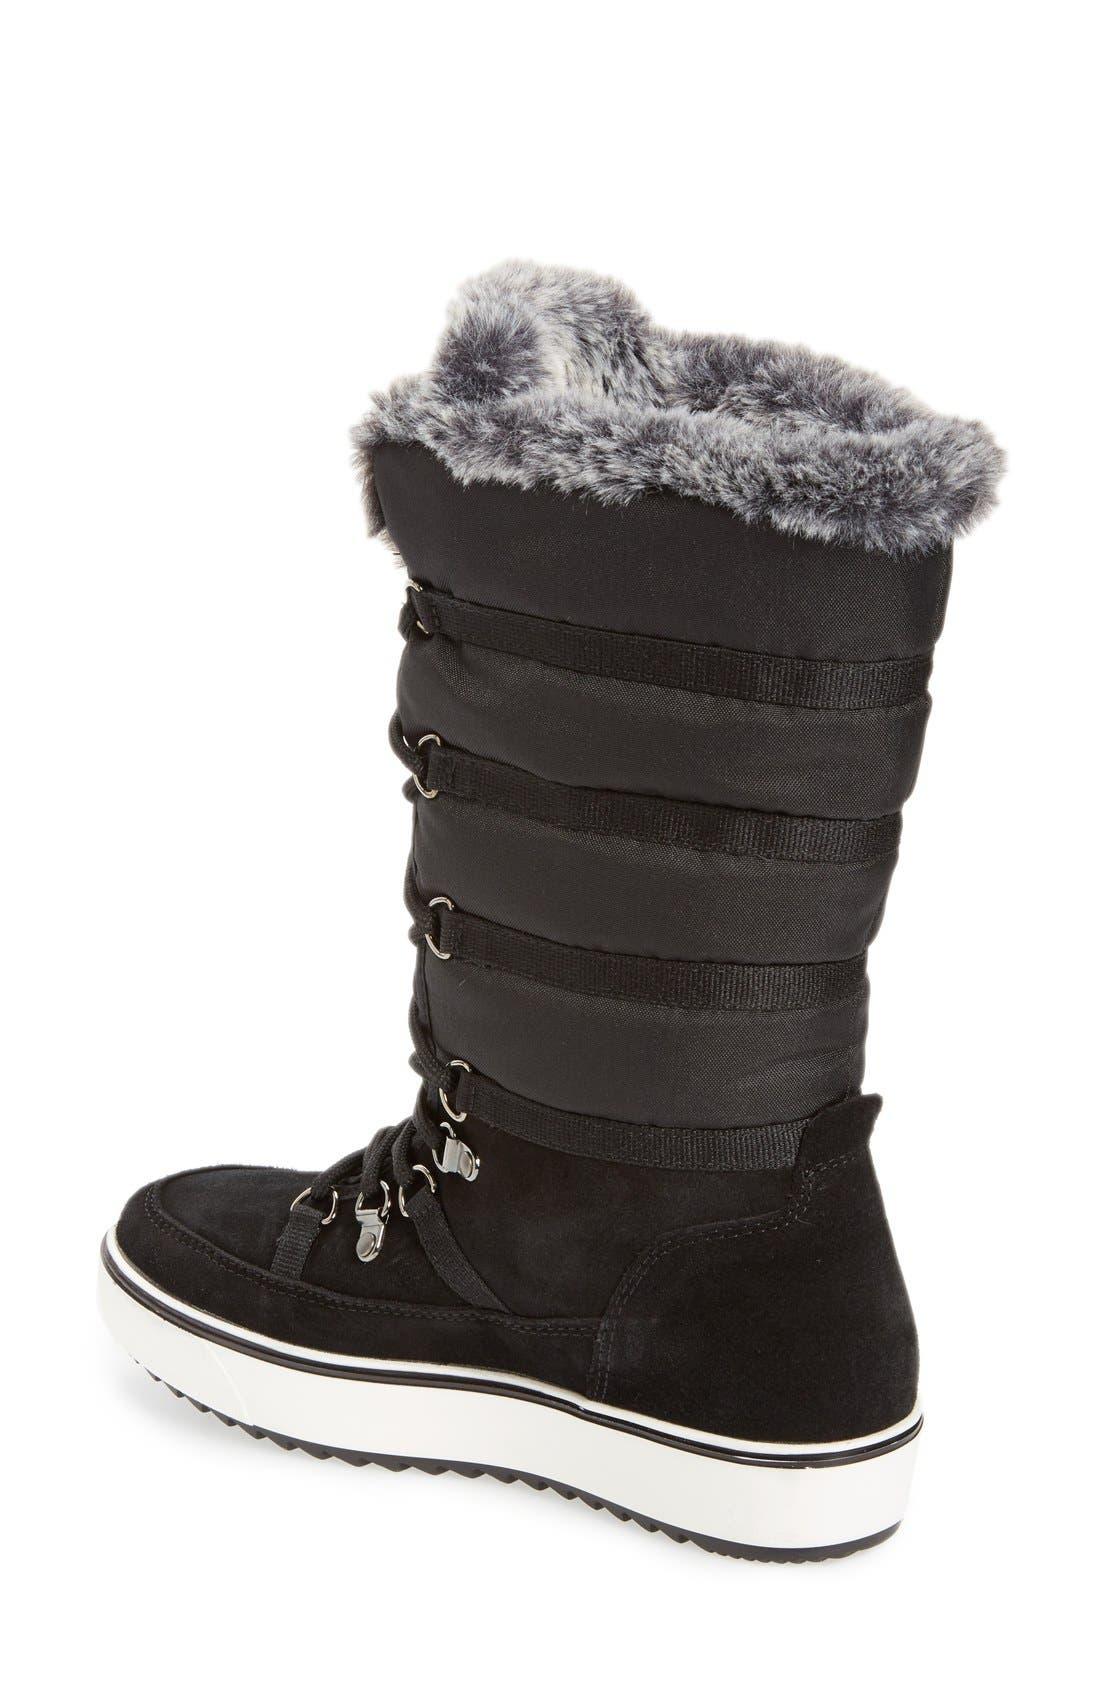 Alternate Image 2  - Santana Canada 'Mackenzie' Faux Fur Waterproof Boot (Women)